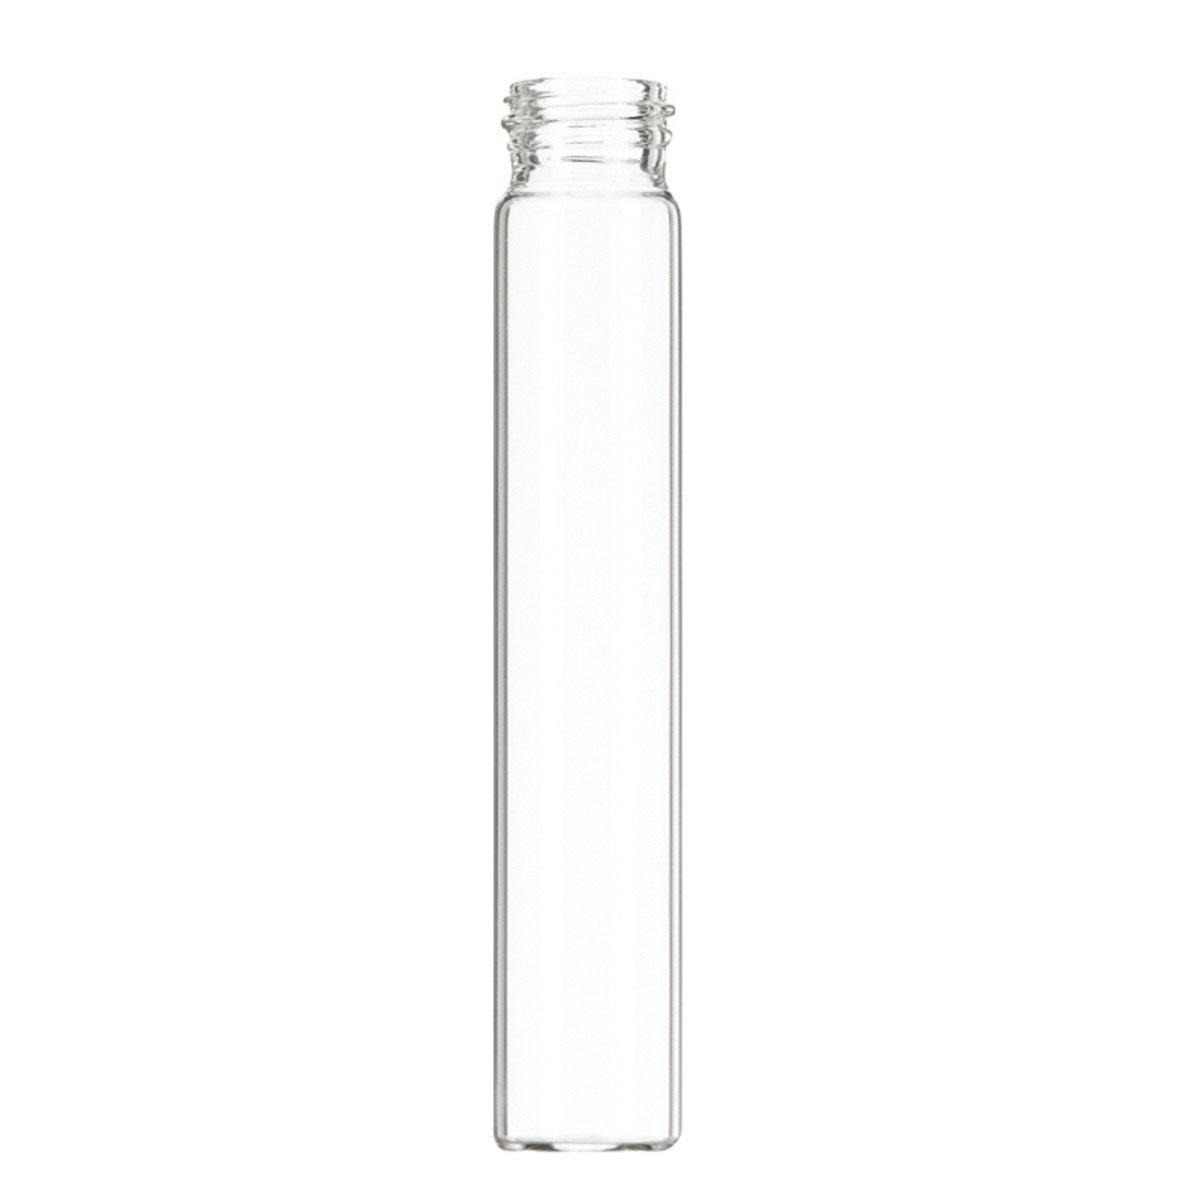 116MM SCREW TOP GLASS PRE-ROLL TUBE (QTY 250)